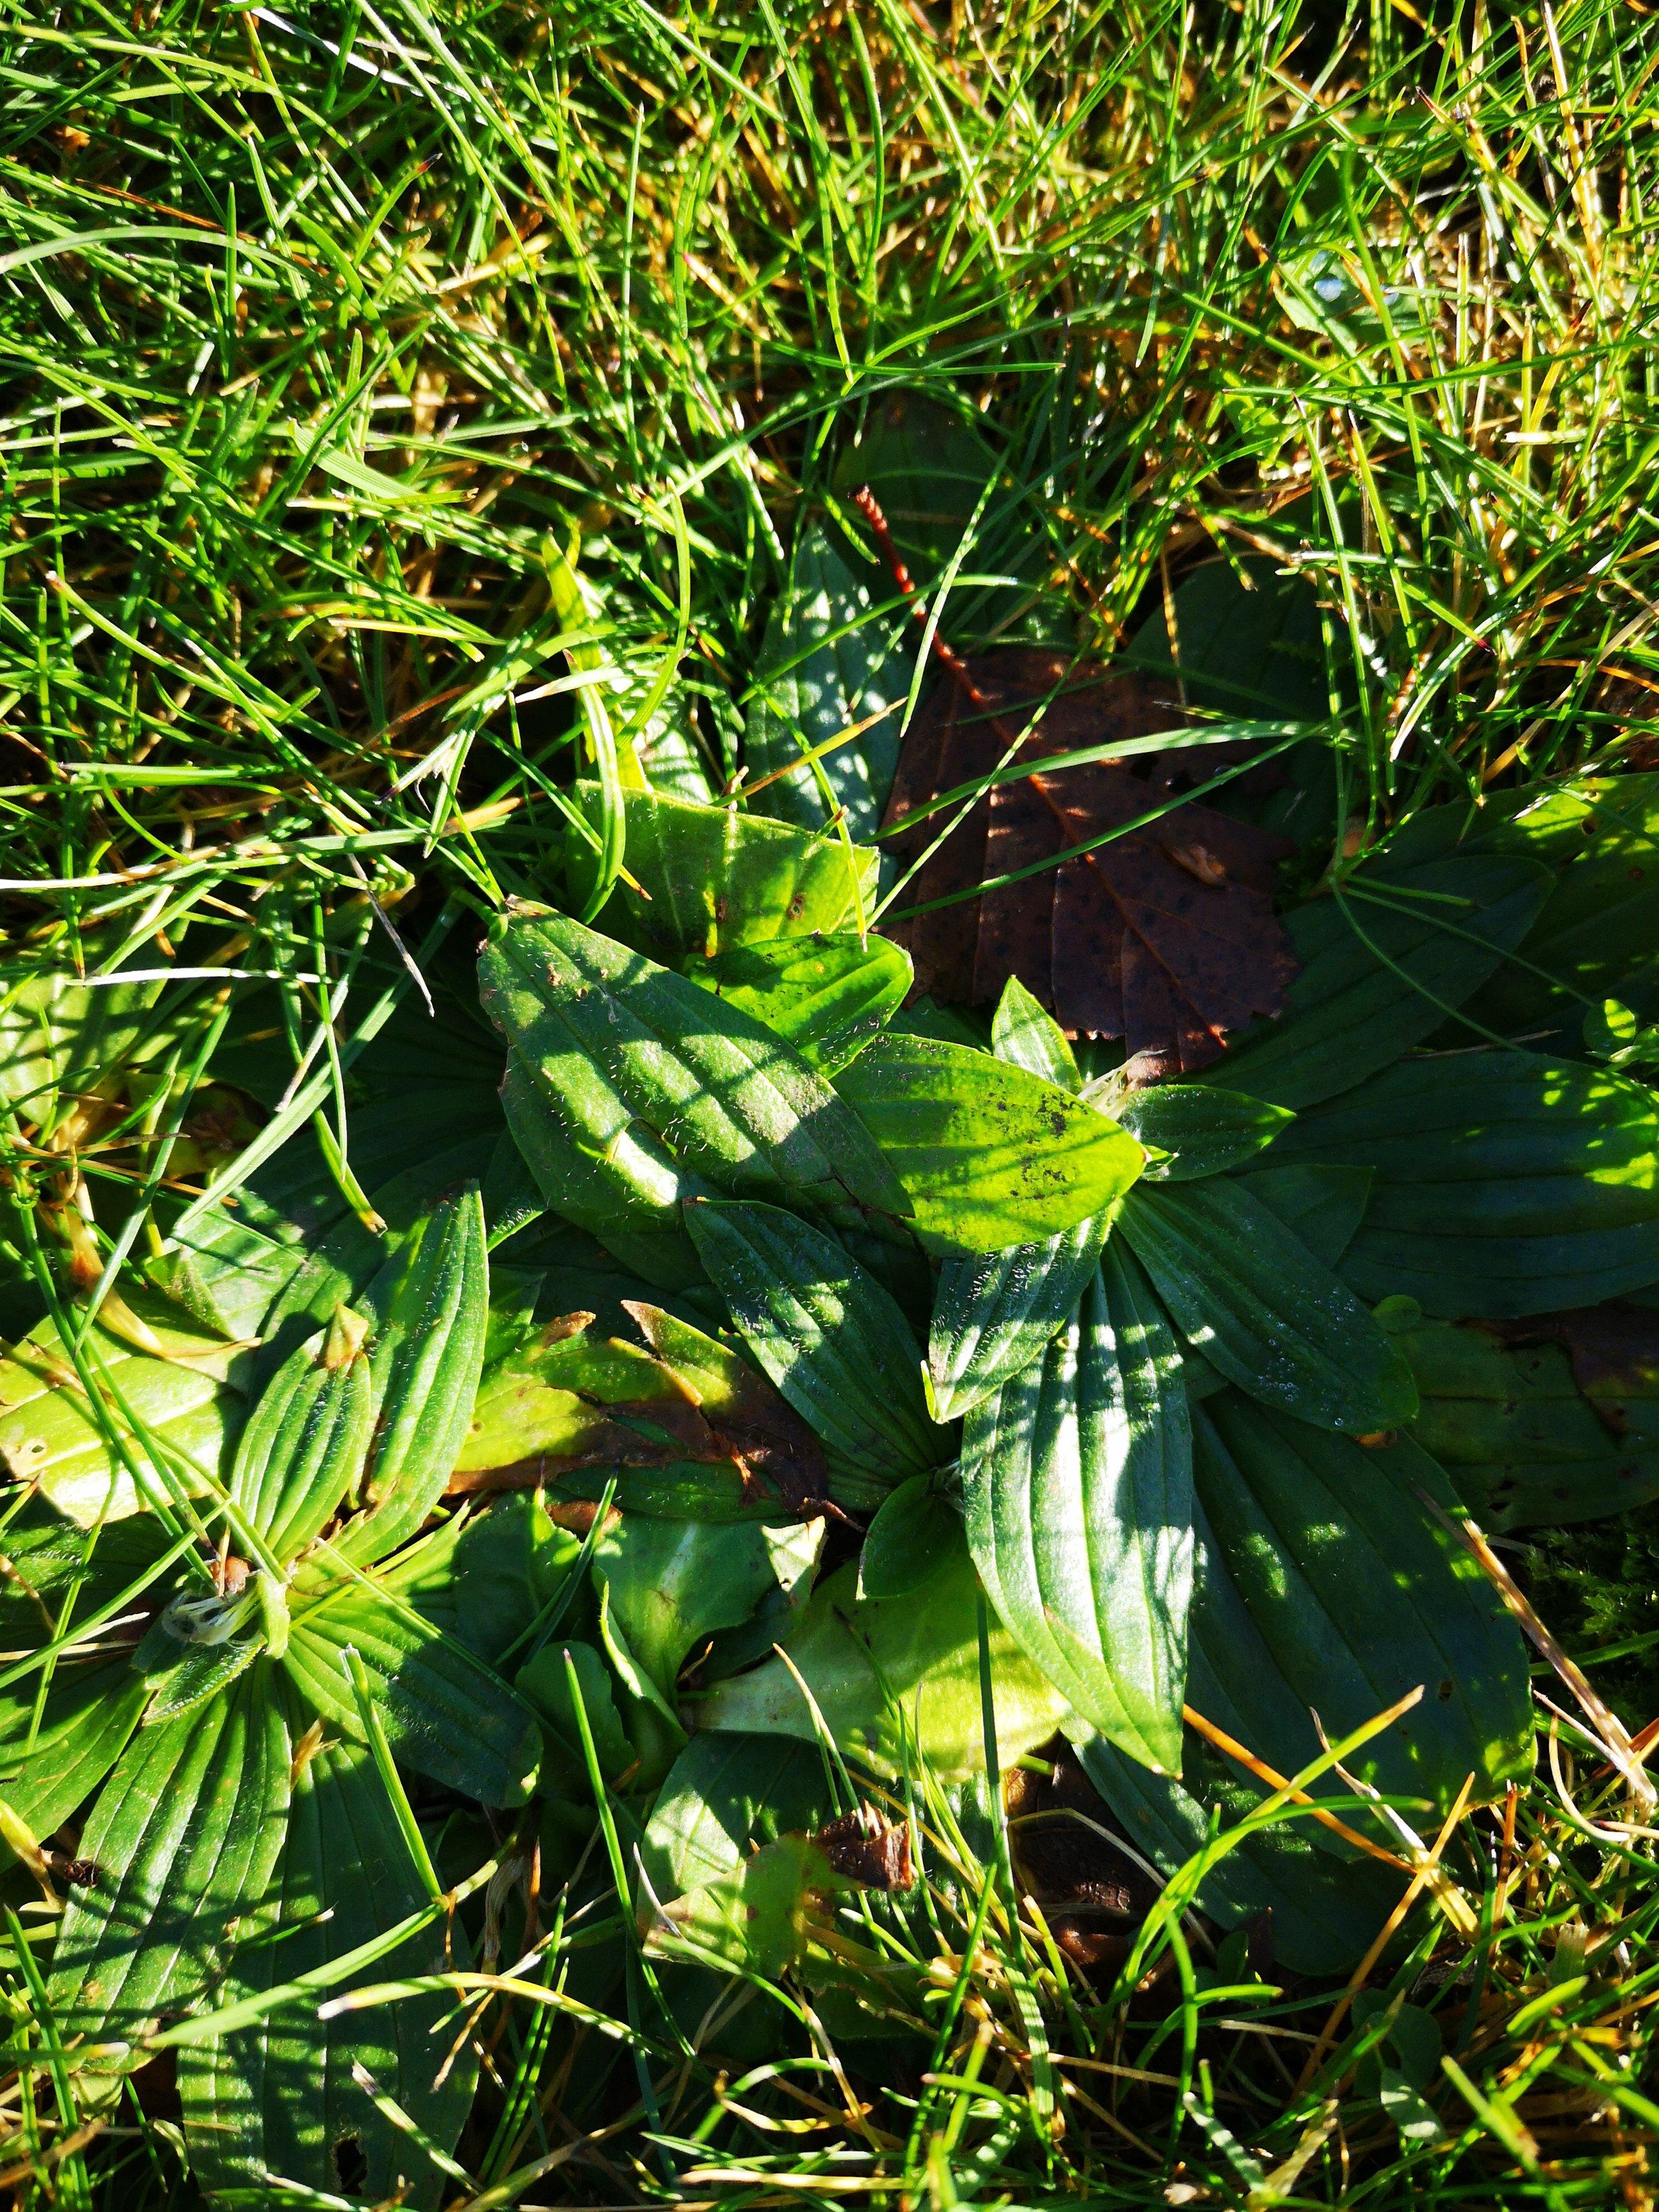 Plantago lanceolata (Ribwort Plantain)